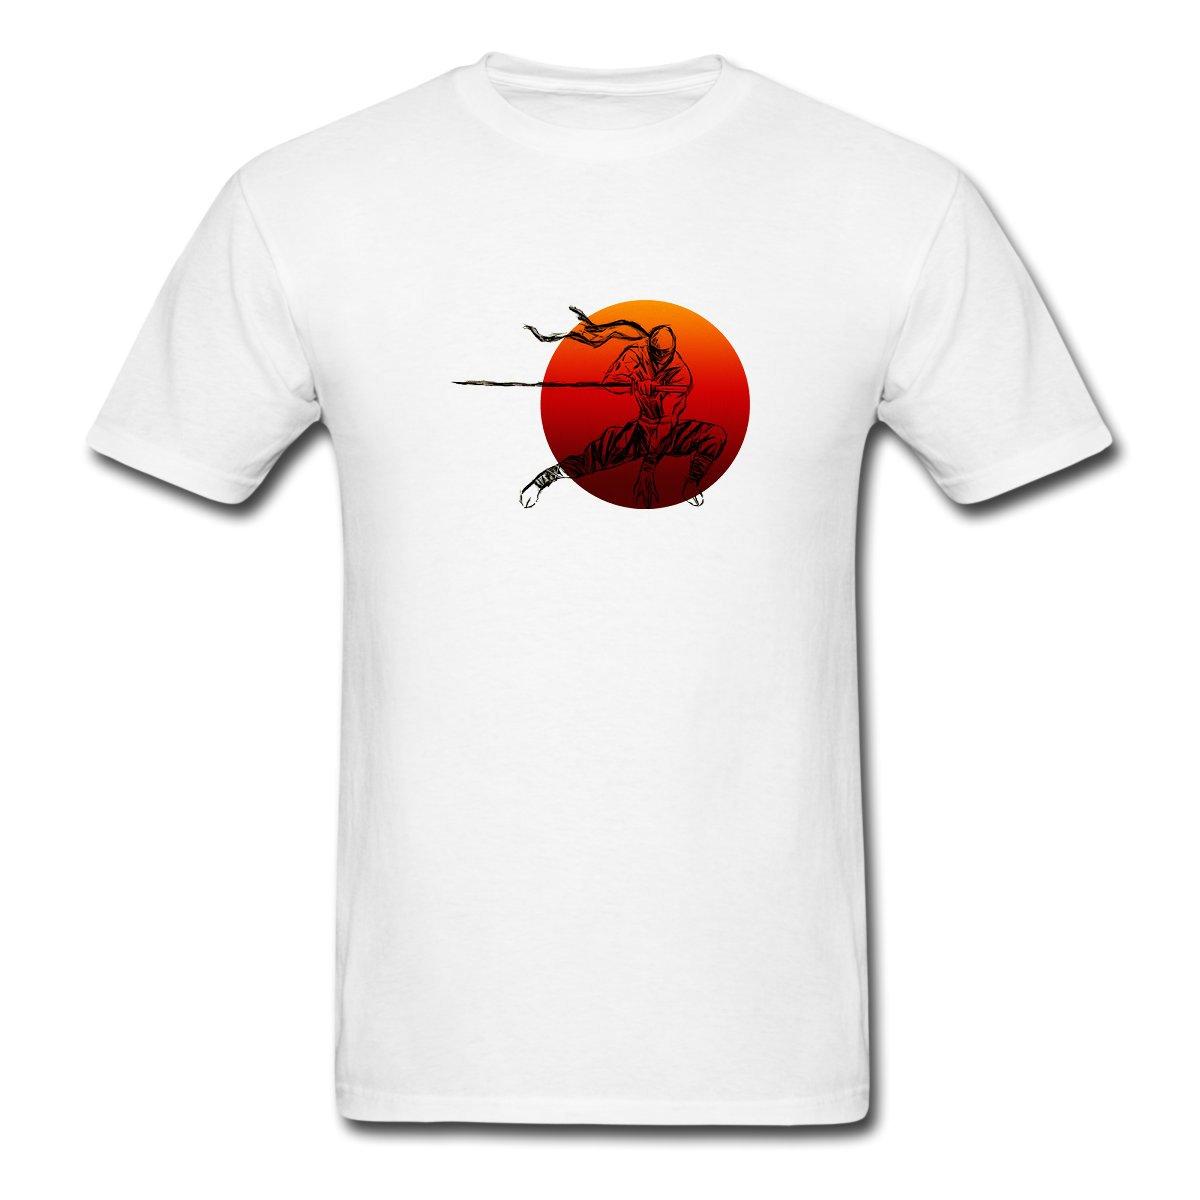 Amazon.com: Pookeng Ninja Paint Mens Funny Short Sleeve T ...